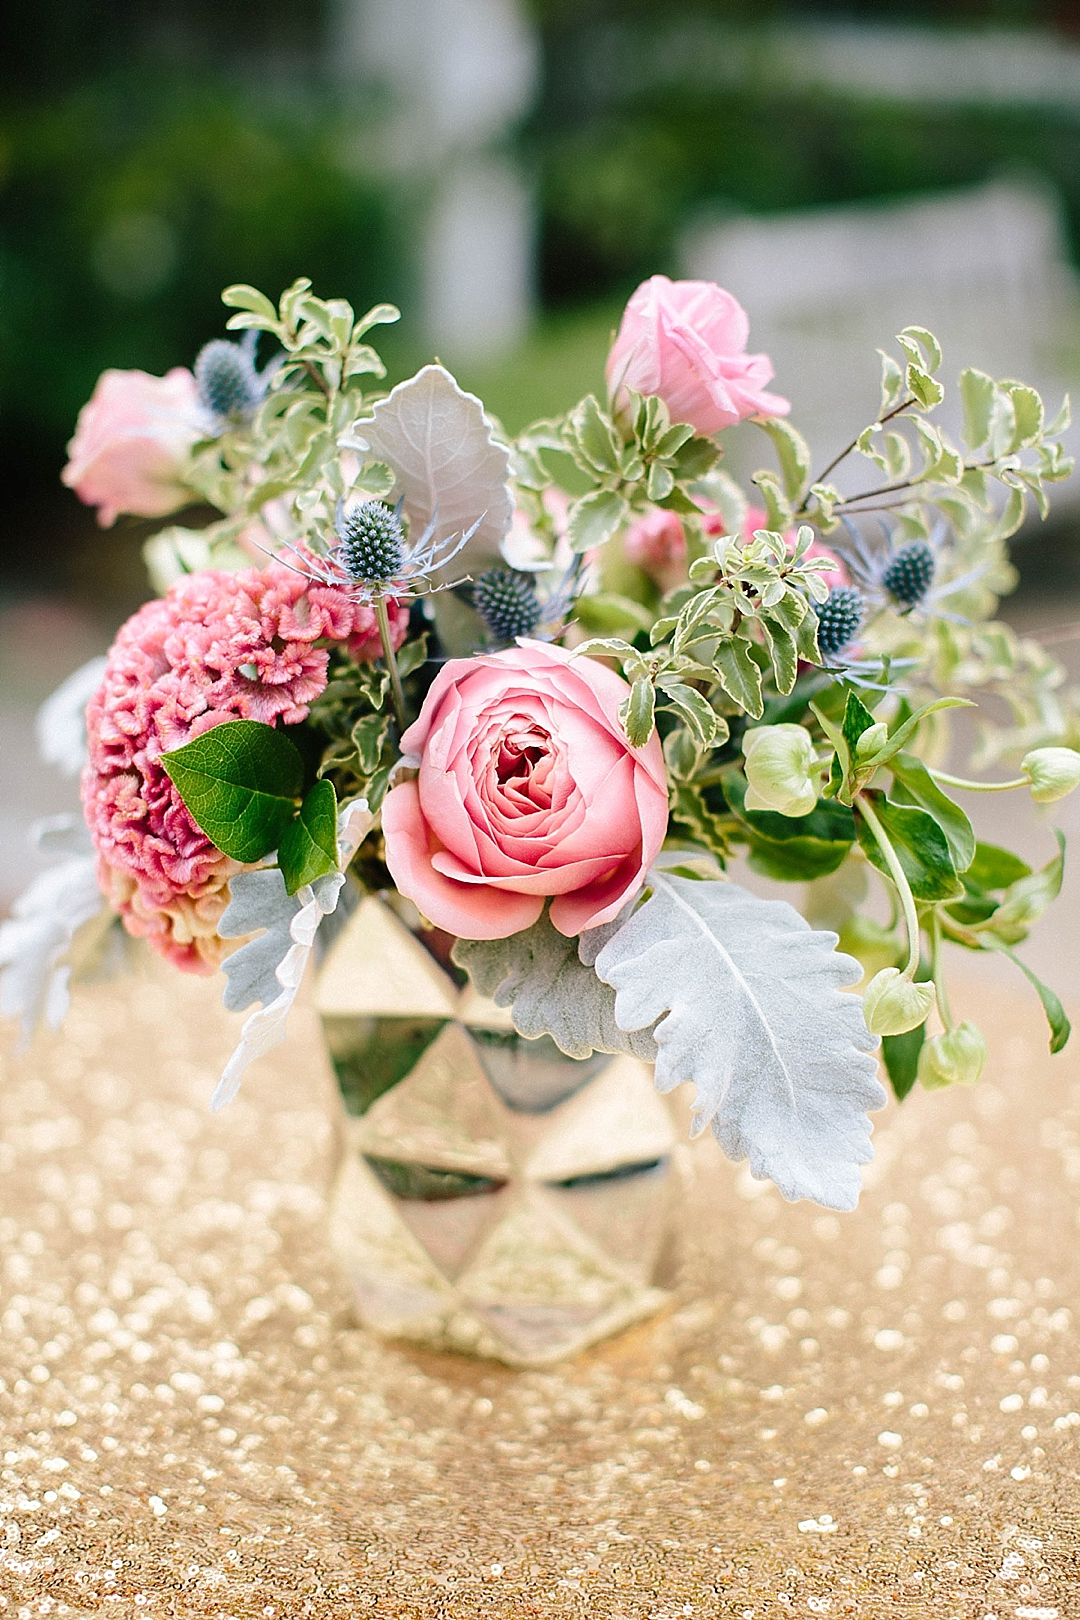 davids bridal for aisle society - flower arrangement